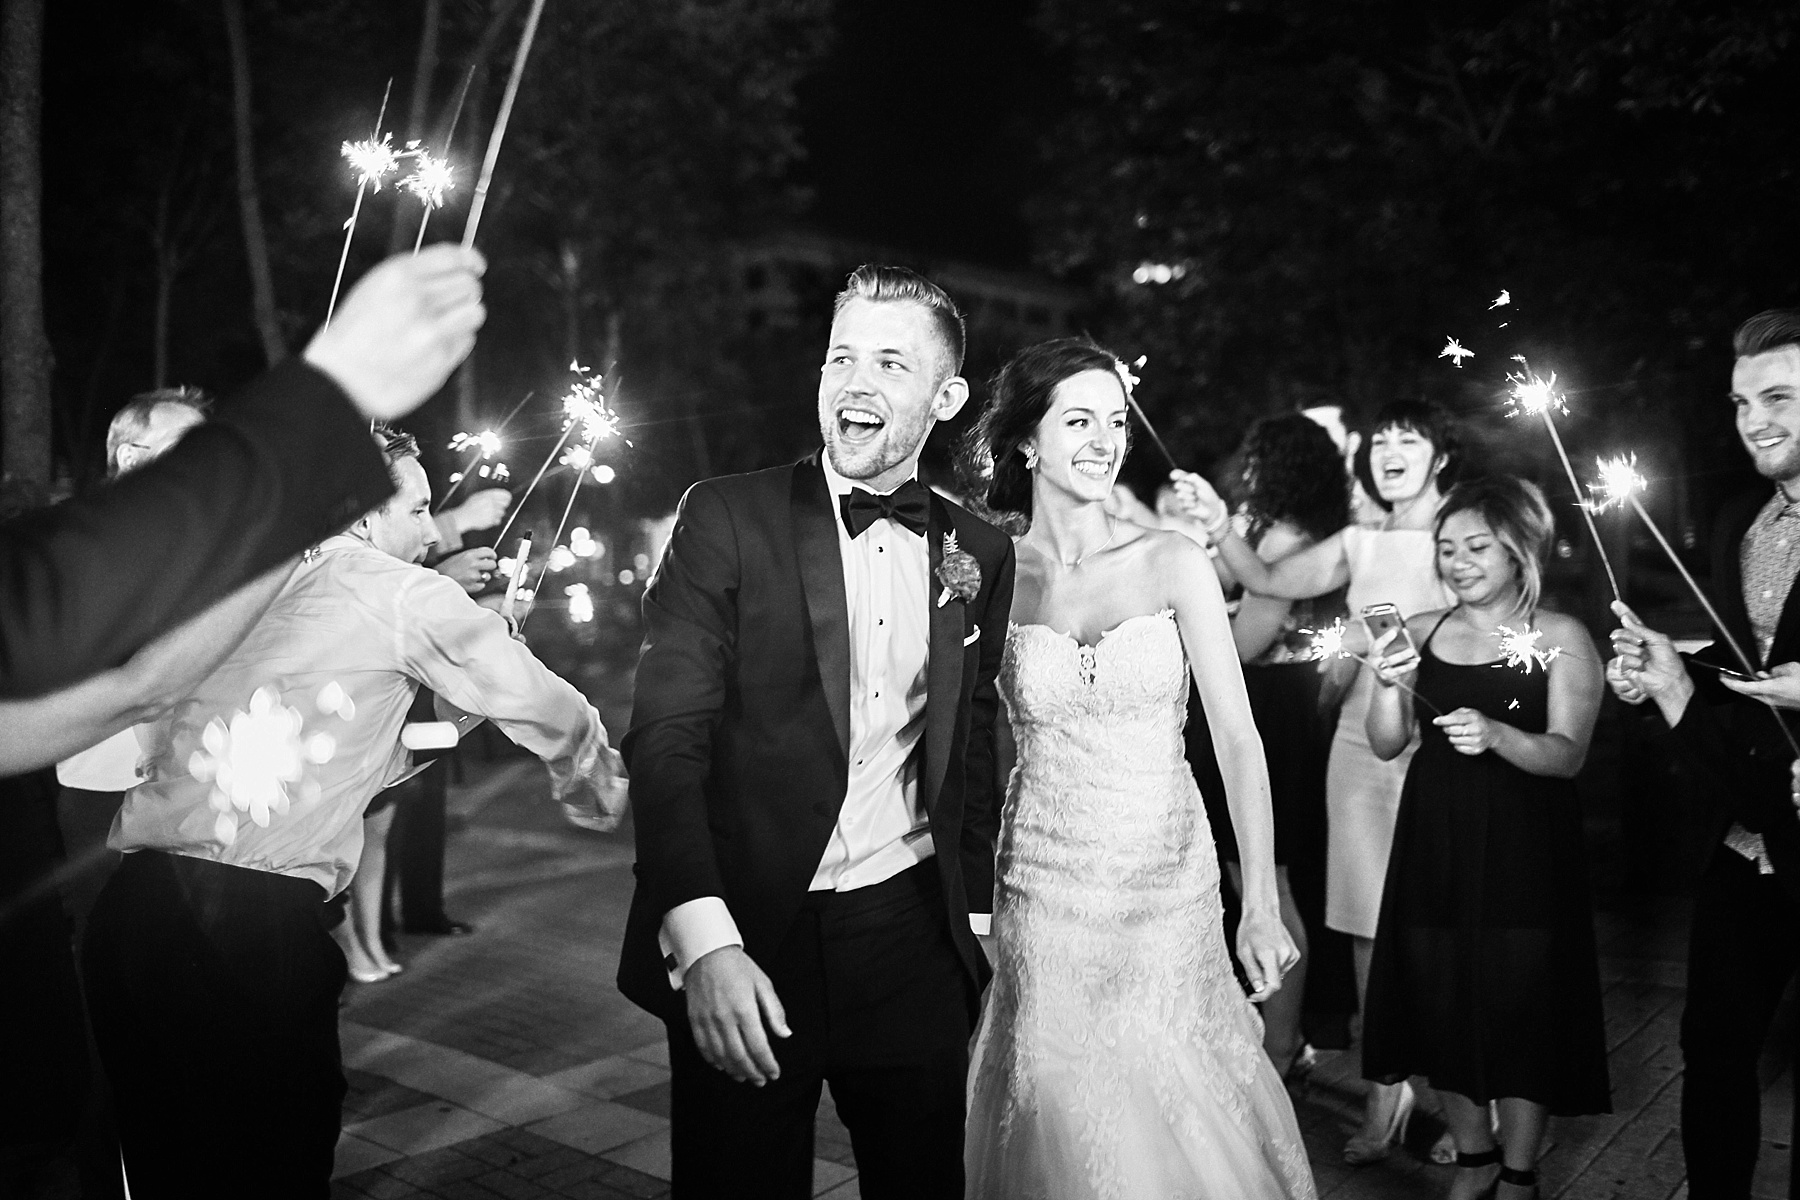 ABULAE-Wedding-Saint-paul-MN-Josh-Sofia-Wedding-Mears-Park_0875.jpg